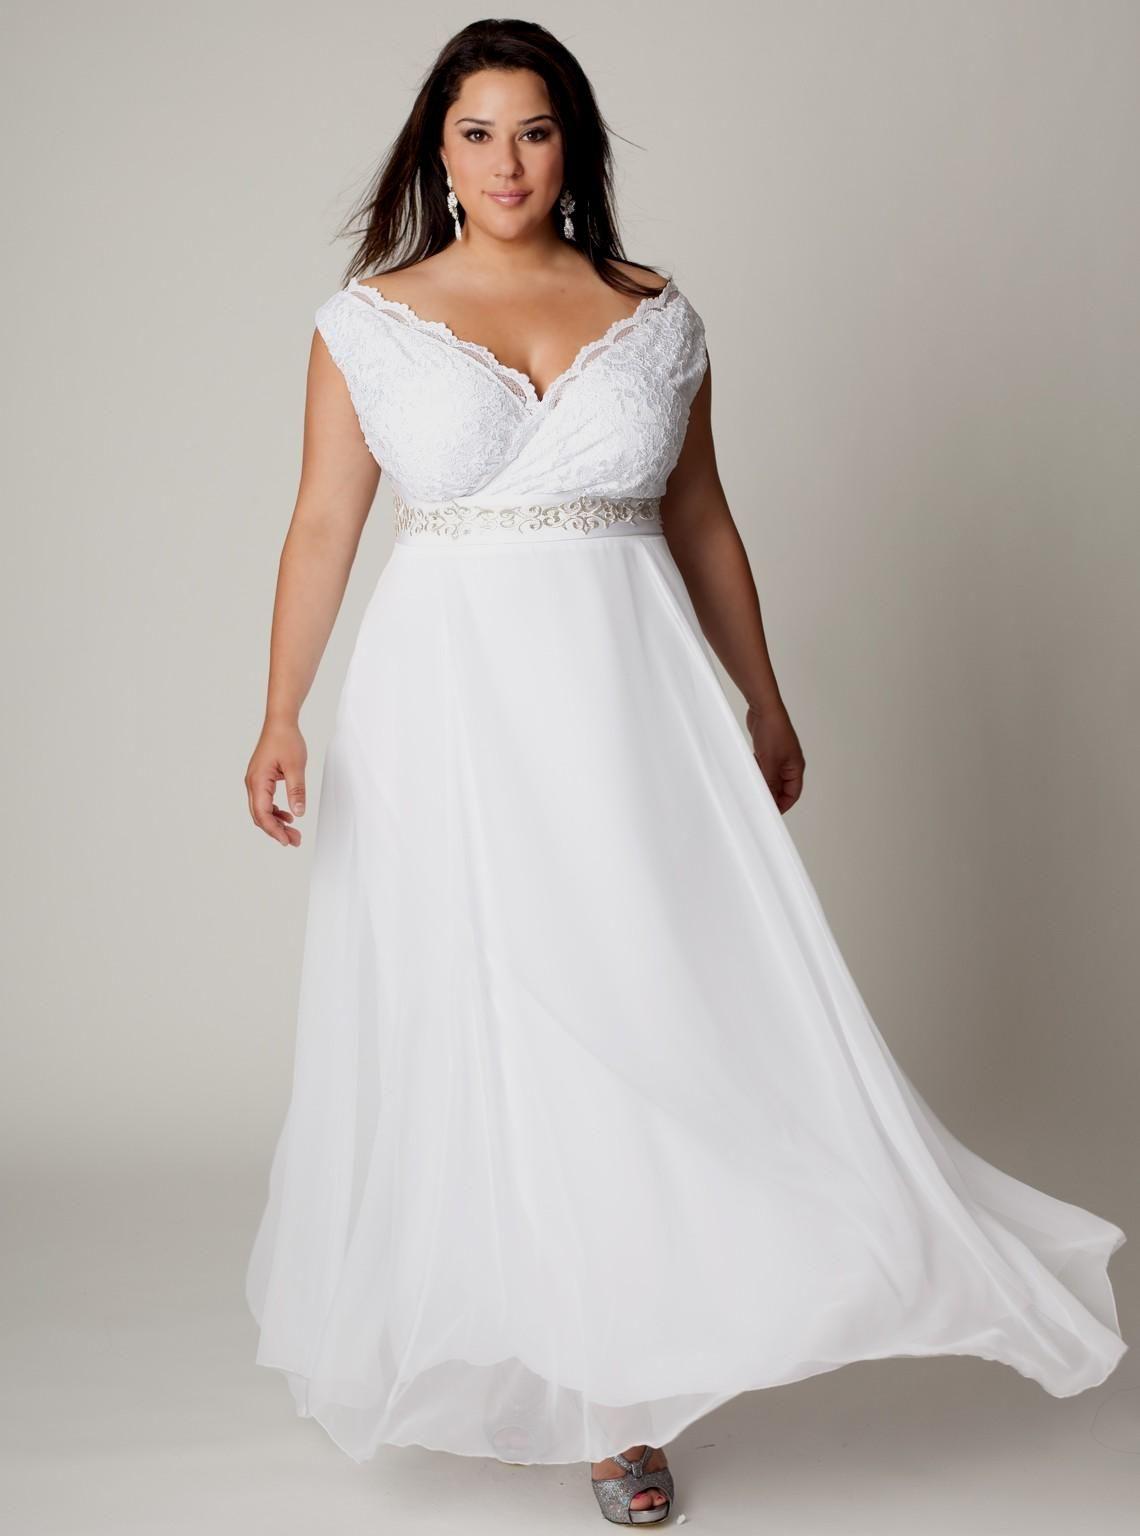 White Beach Dresses Plus Size Bridesmaid Dresses Plus Size Popular Wedding Dresses Trendy Plus Size Dresses [ 1536 x 1140 Pixel ]